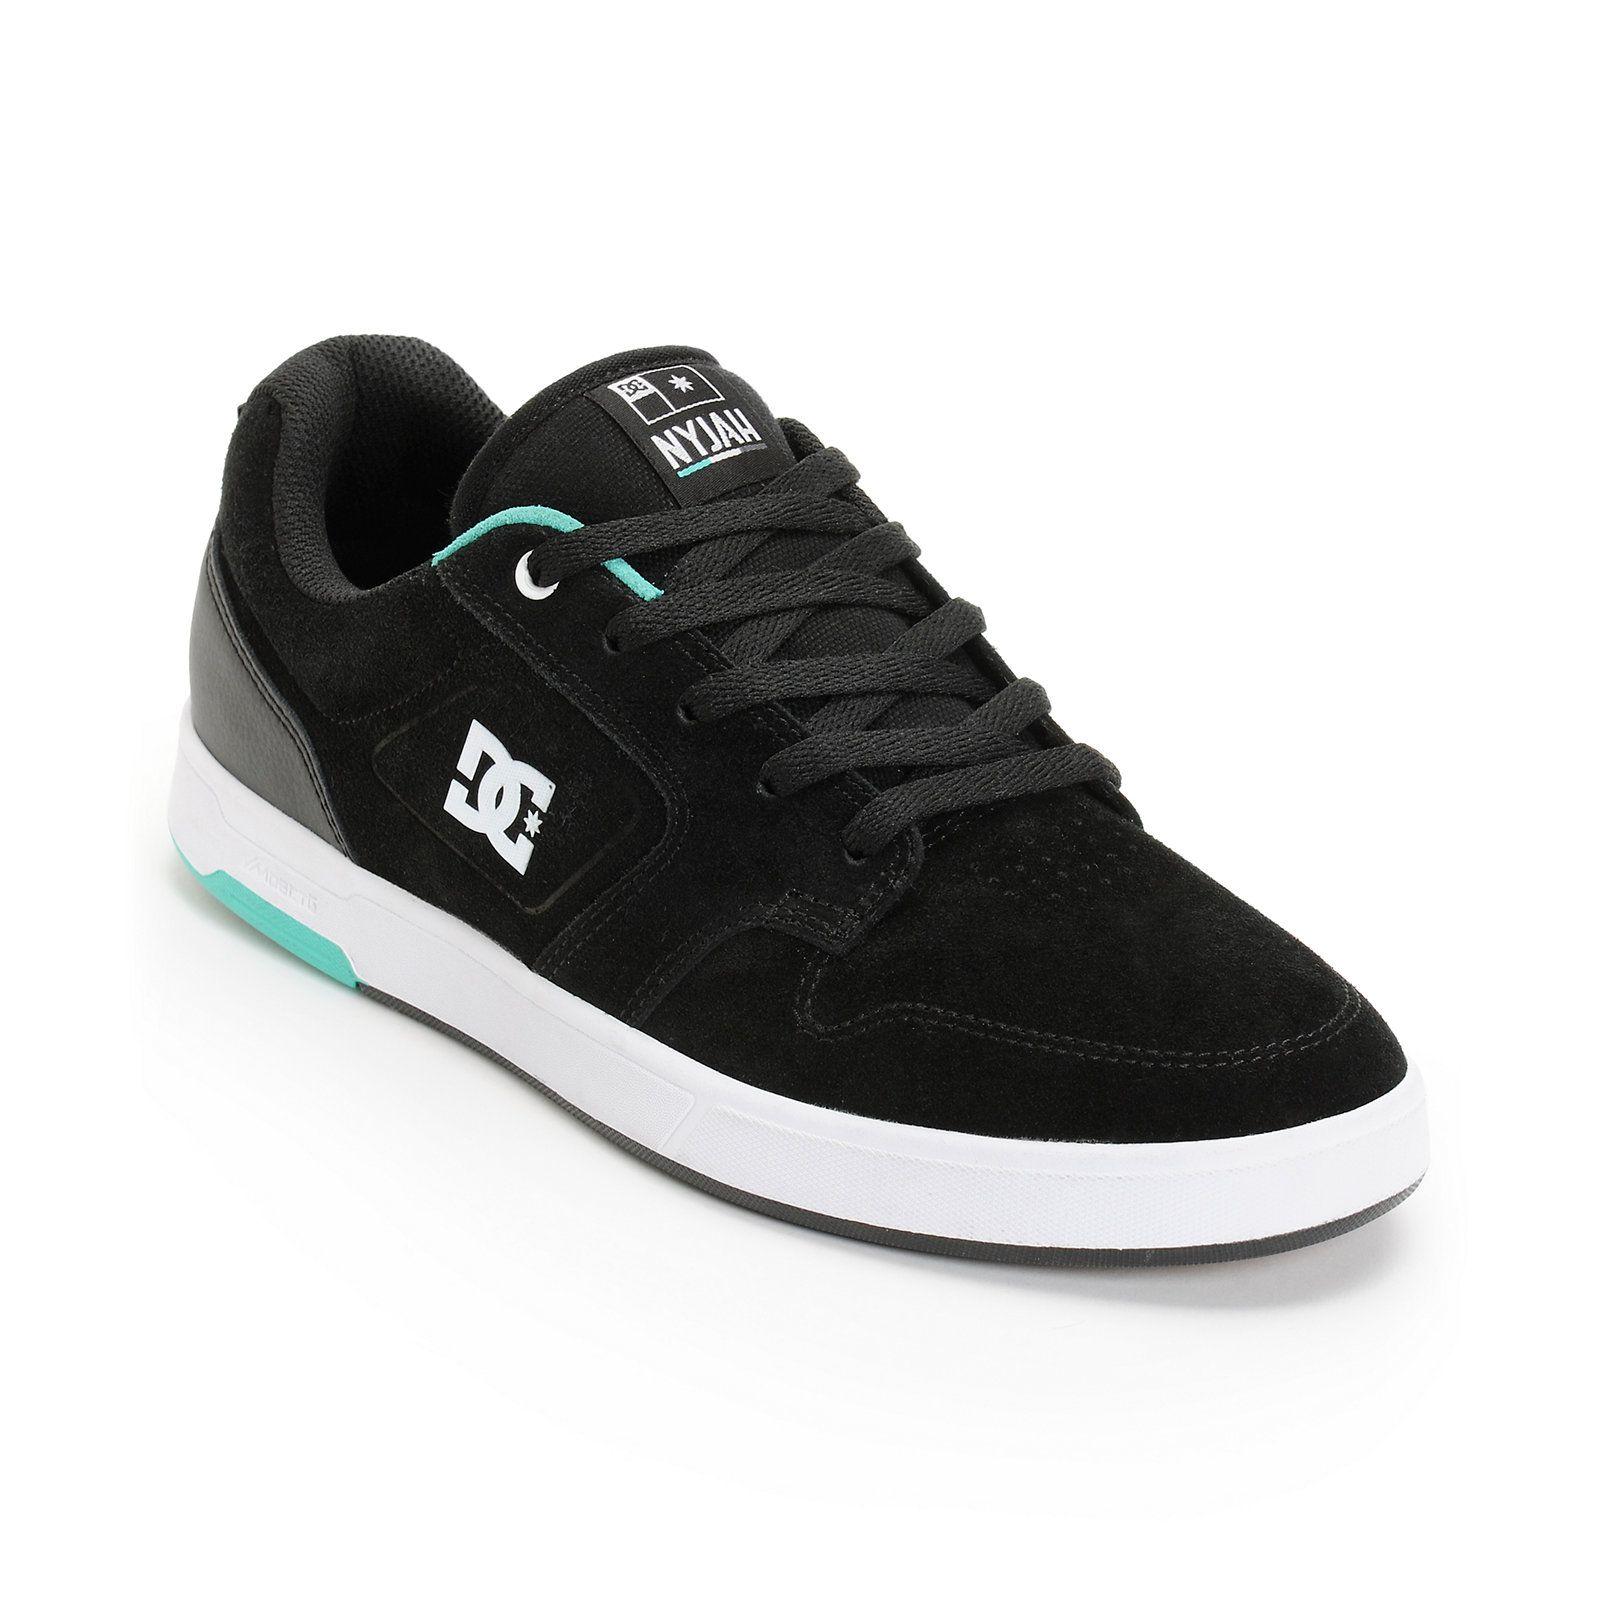 Adidas skate shoes zumiez - Dc Nyjah Huston S Black Mint Skate Shoe At Zumiez Pdp